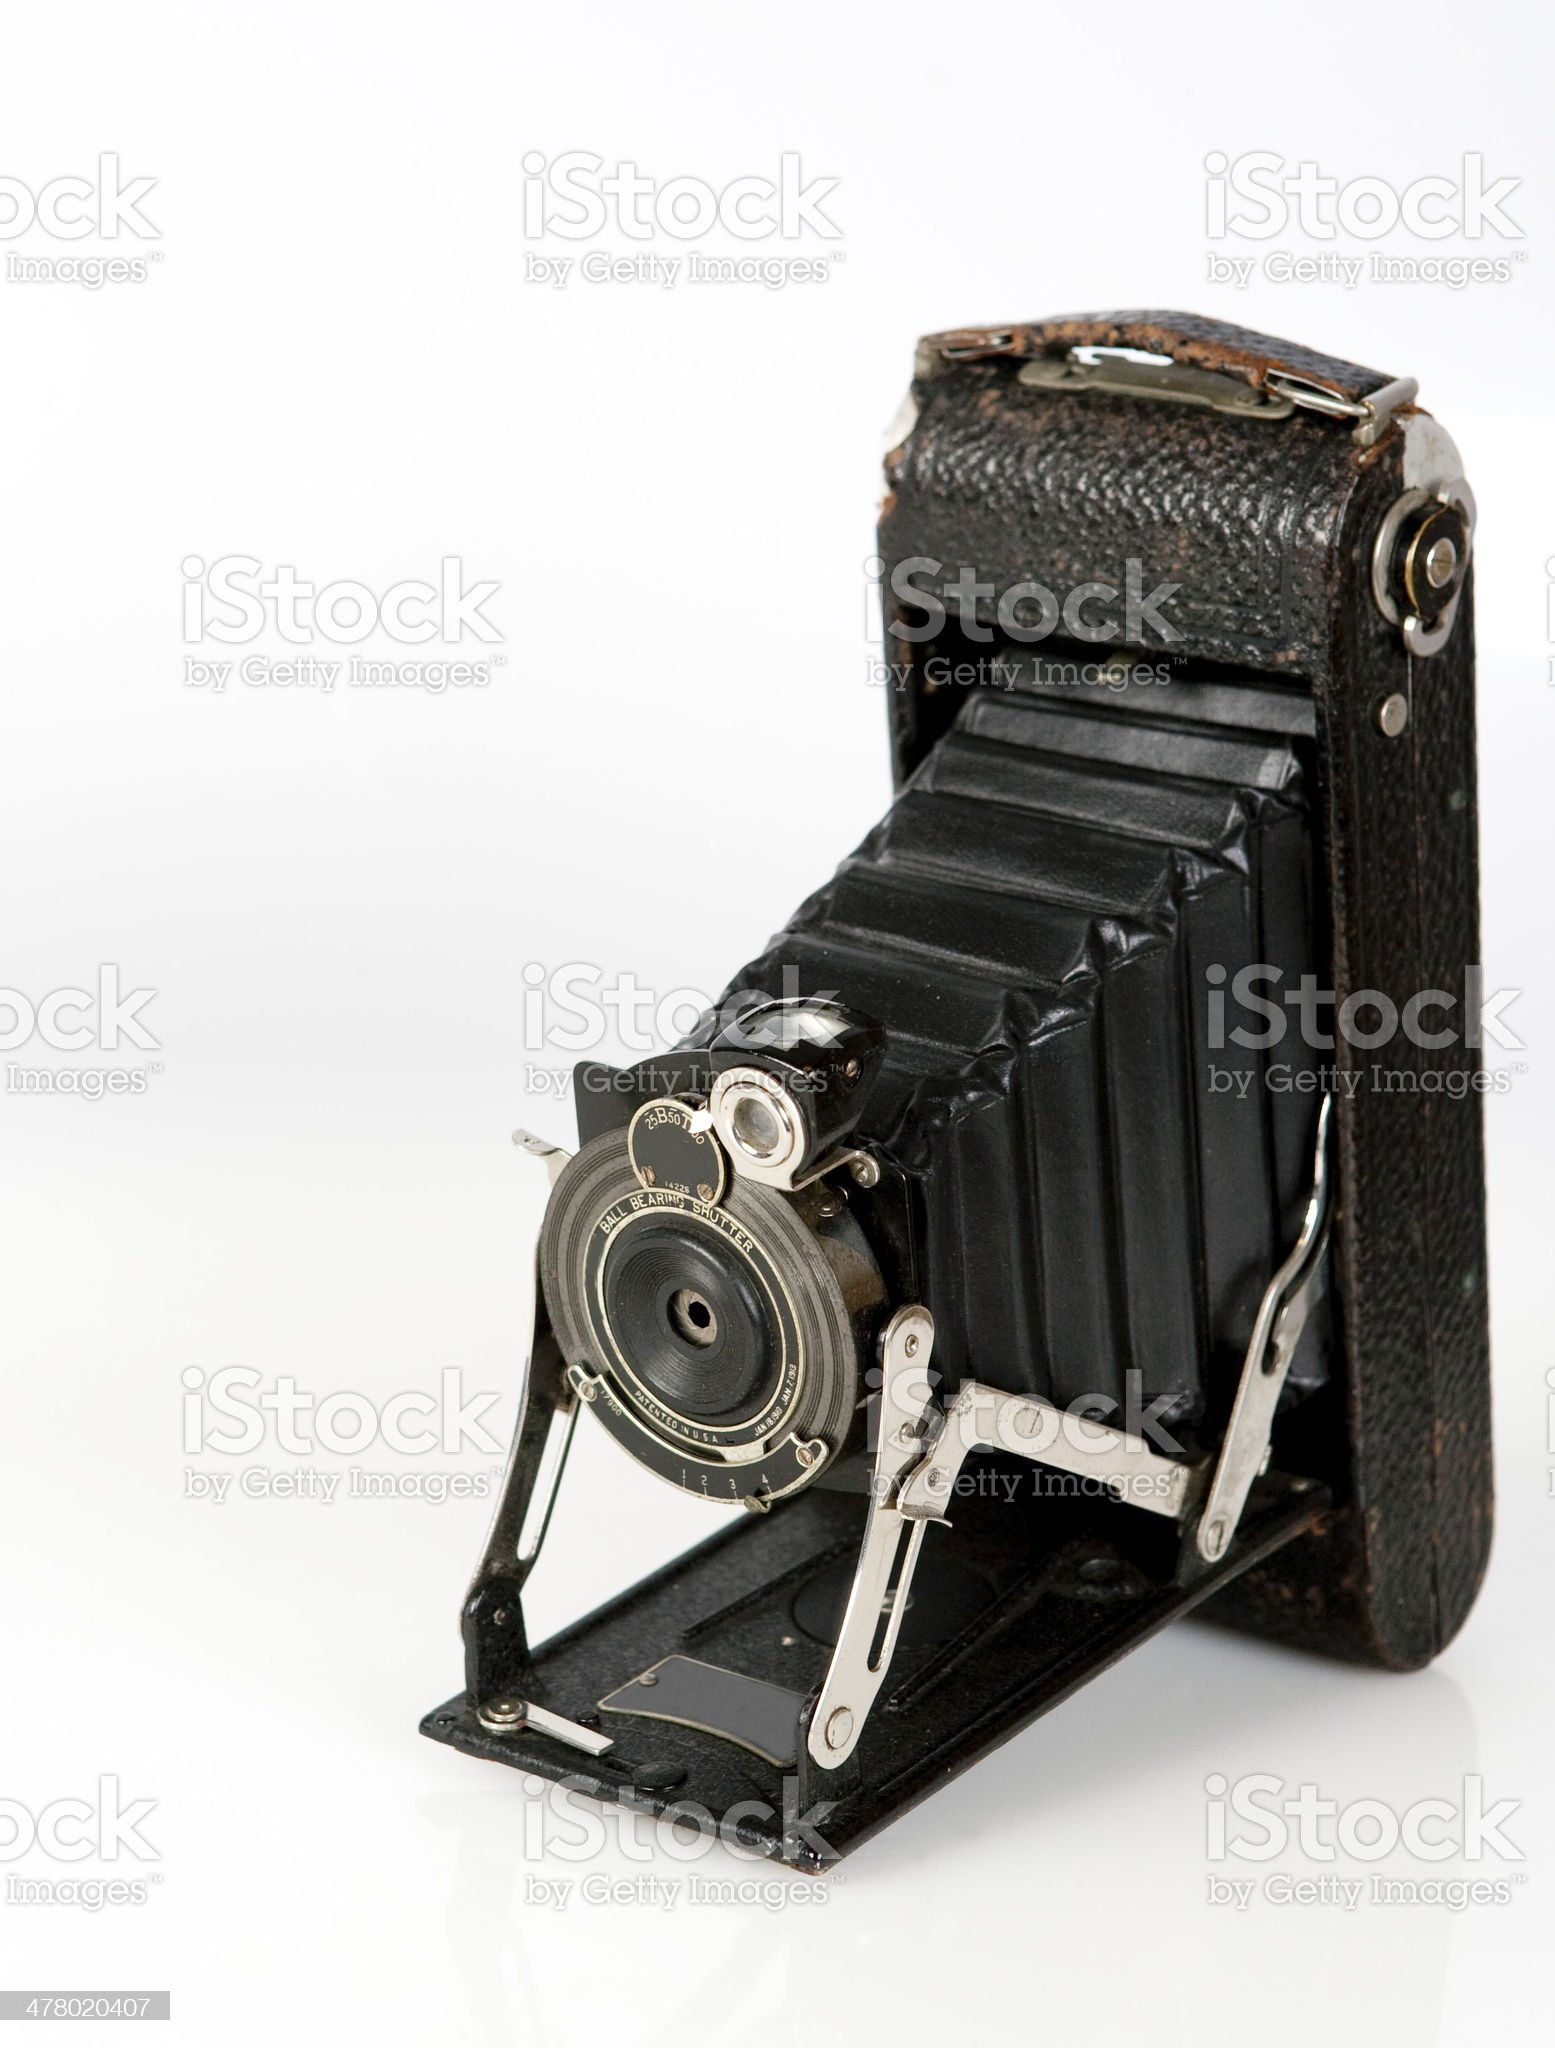 Vintage folding cameras royalty-free stock photo